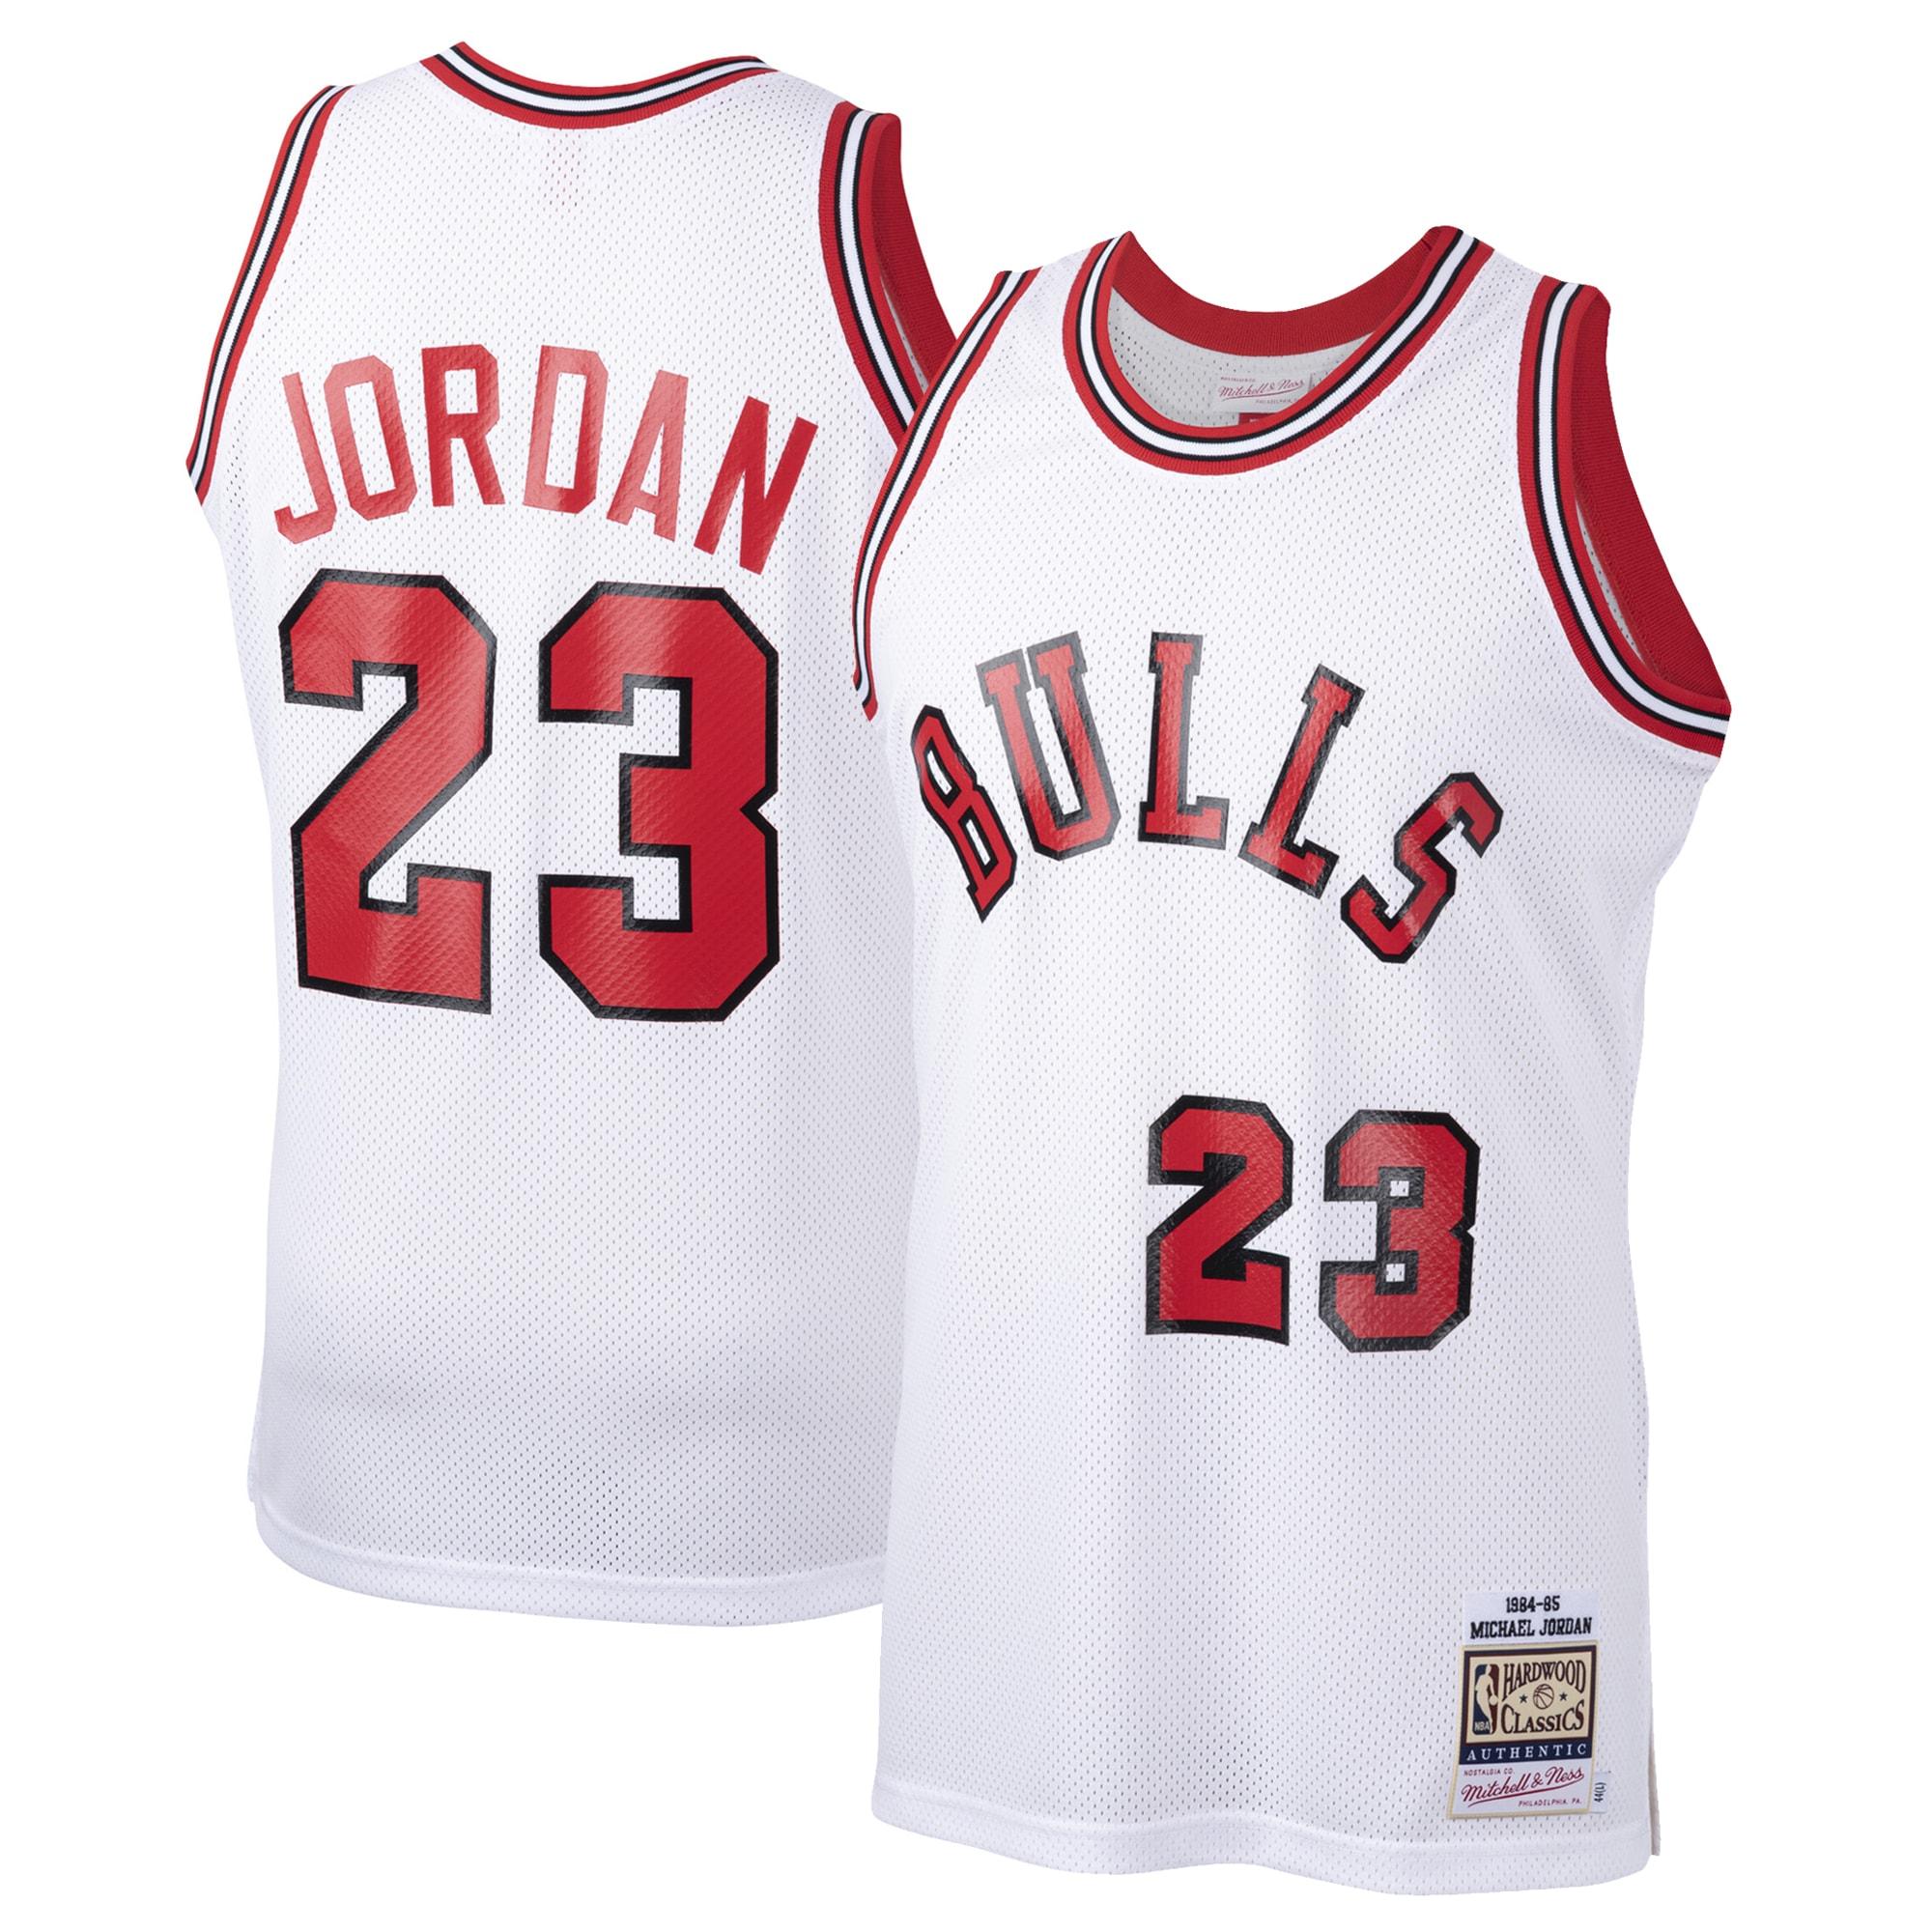 Michael Jordan Chicago Bulls Mitchell & Ness 1984-85 Hardwood Classics Rookie Authentic Jersey - White